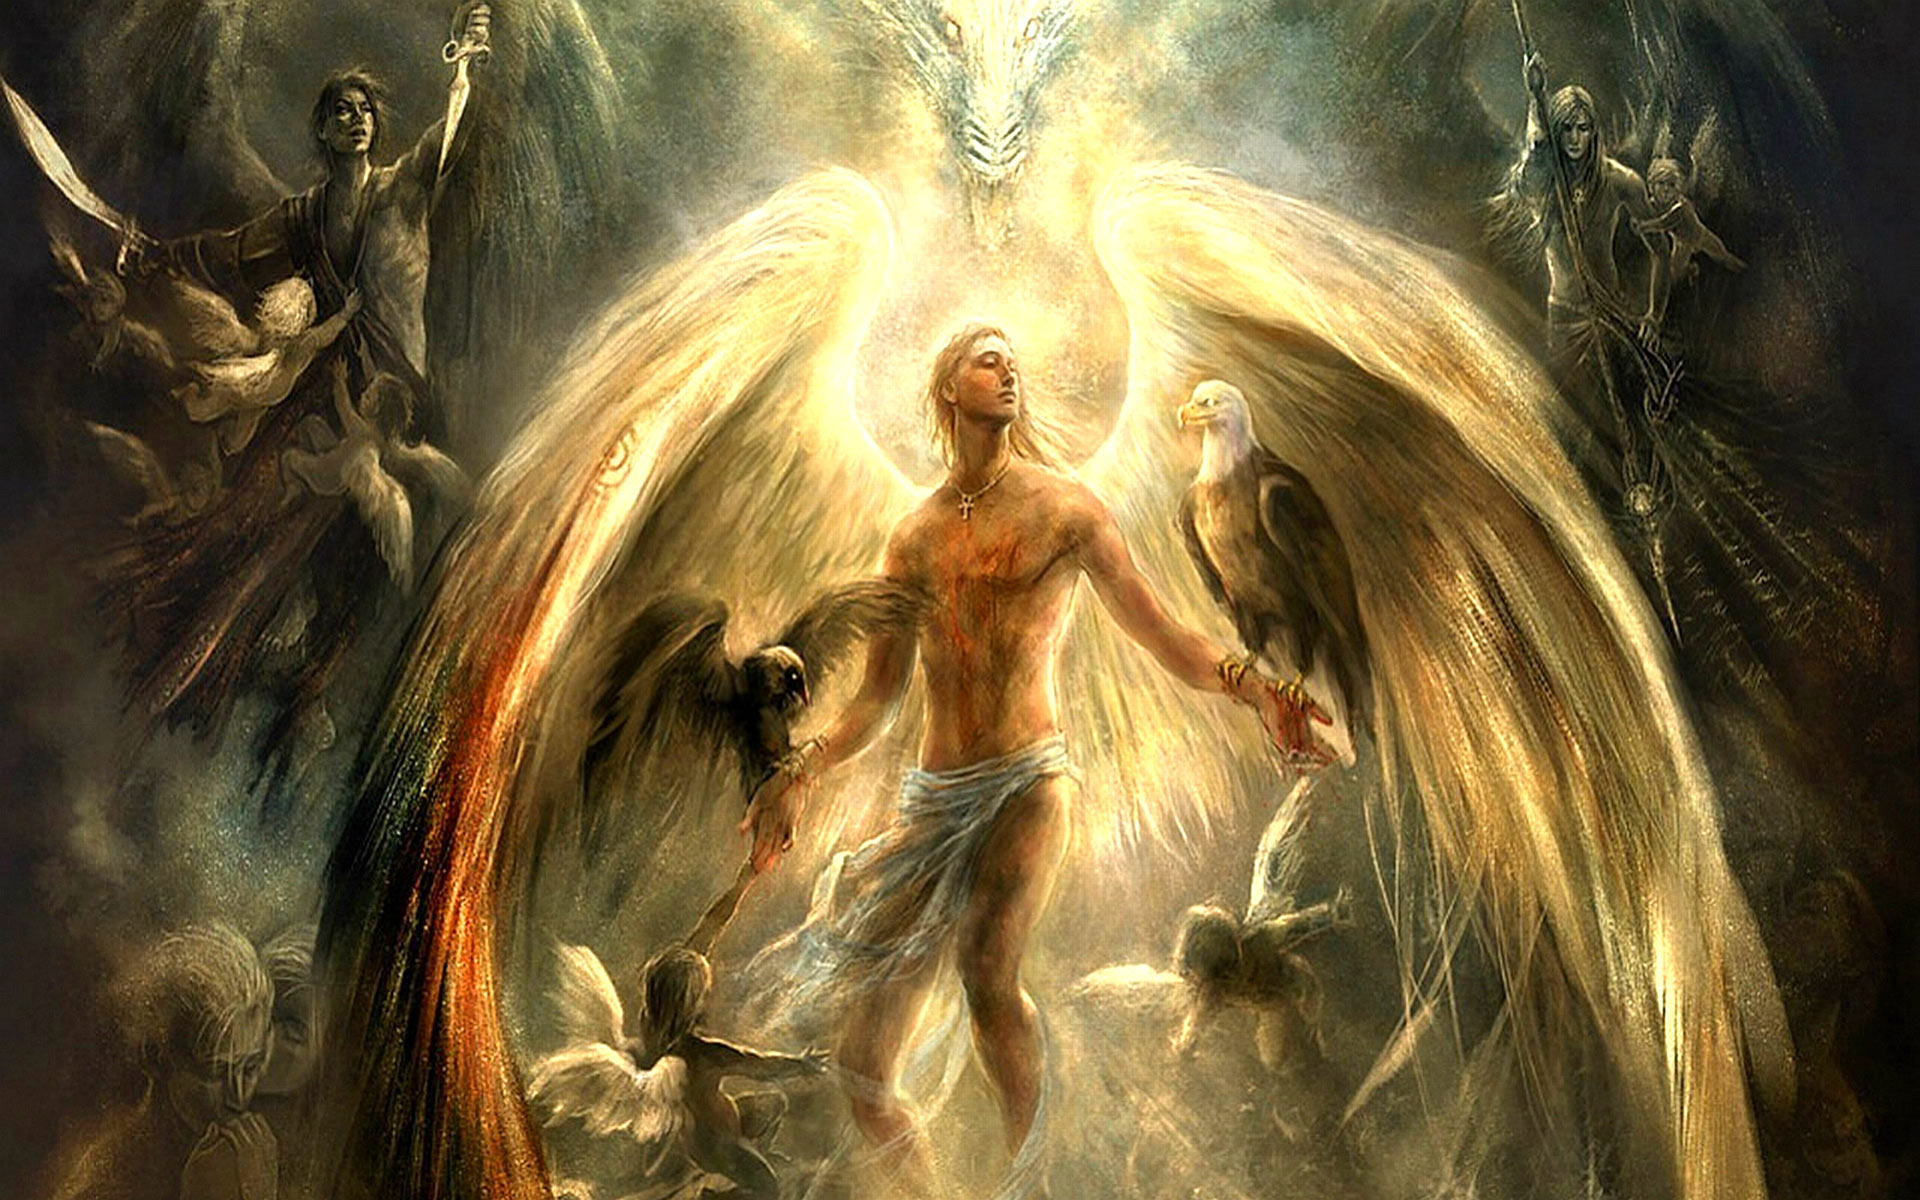 1920x1200px guardian angels wallpaper free - wallpapersafari